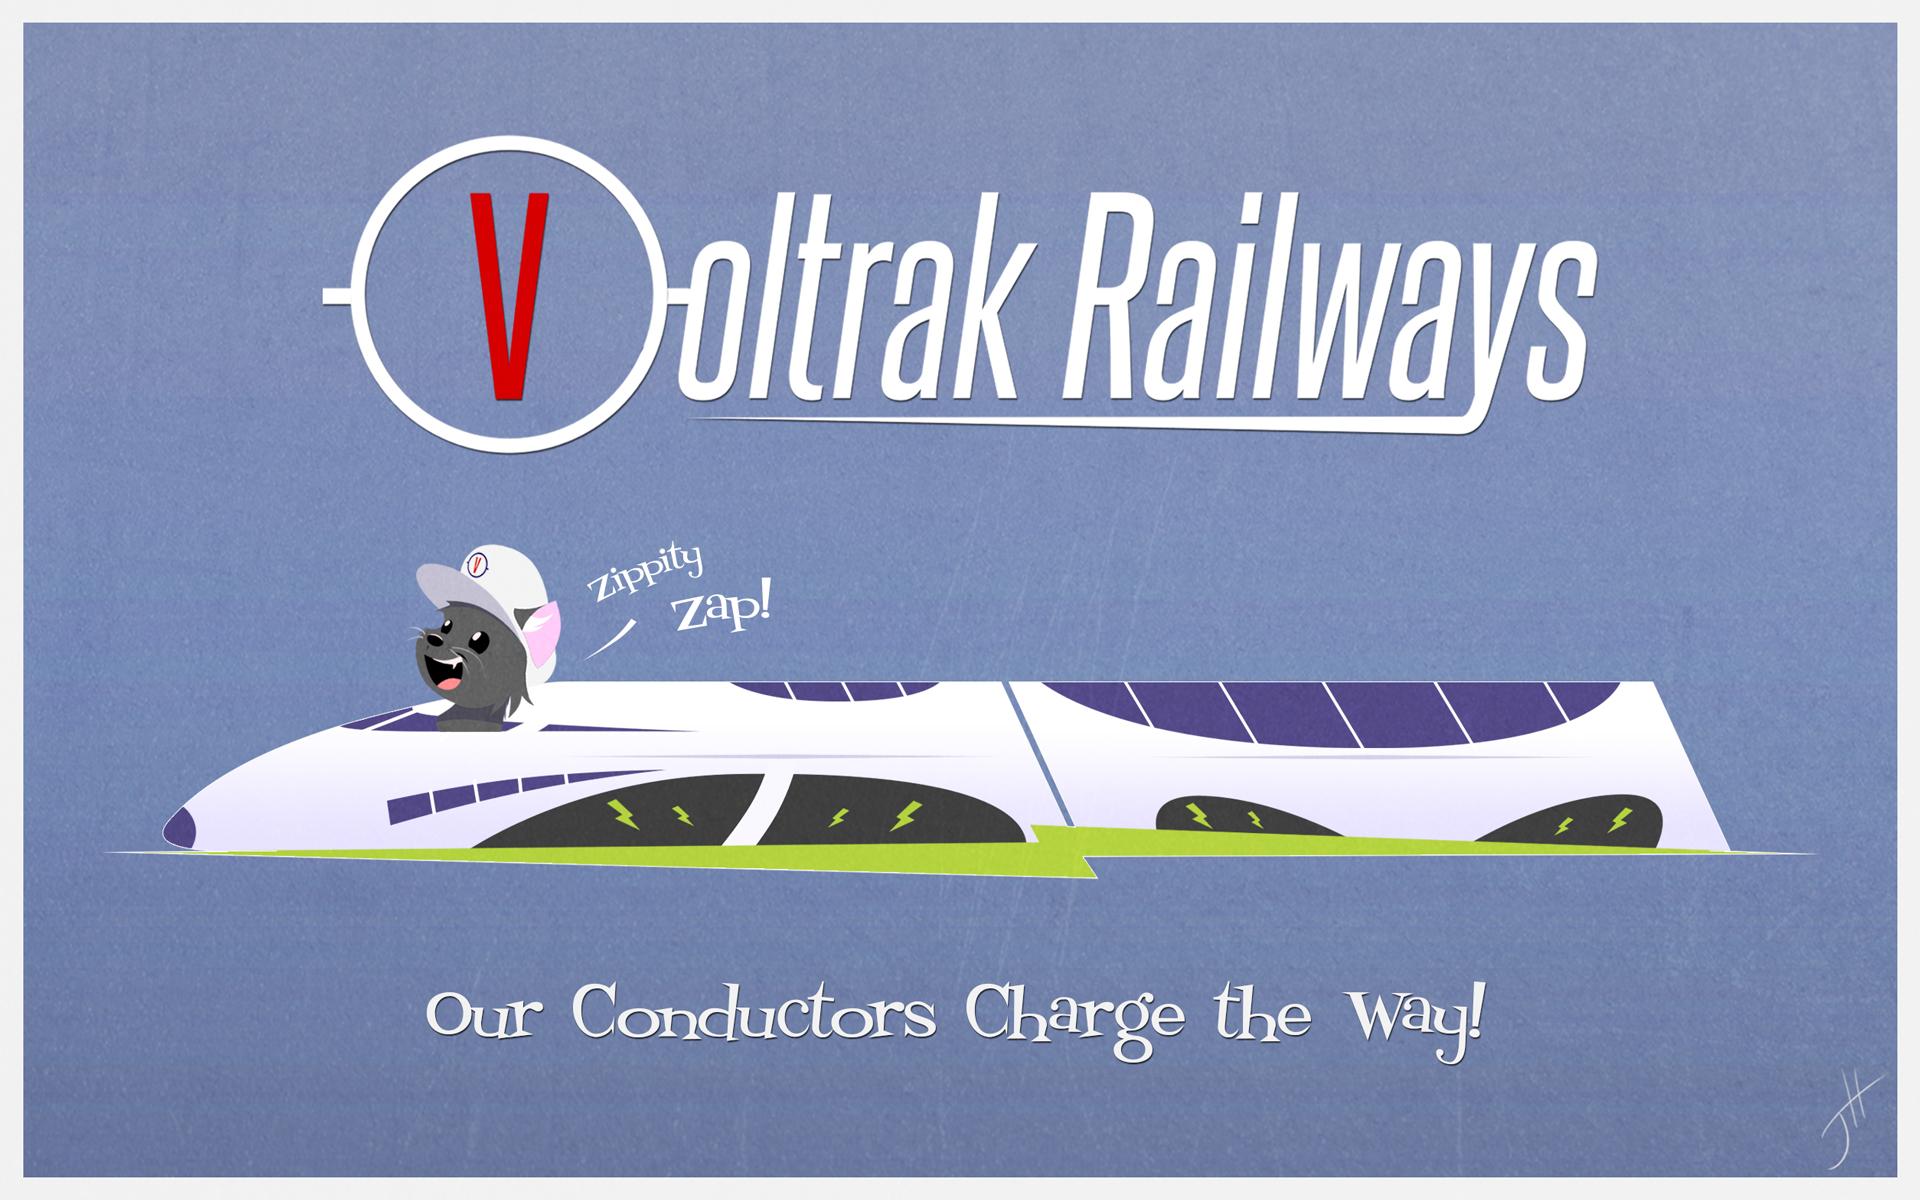 Voltrak Railways